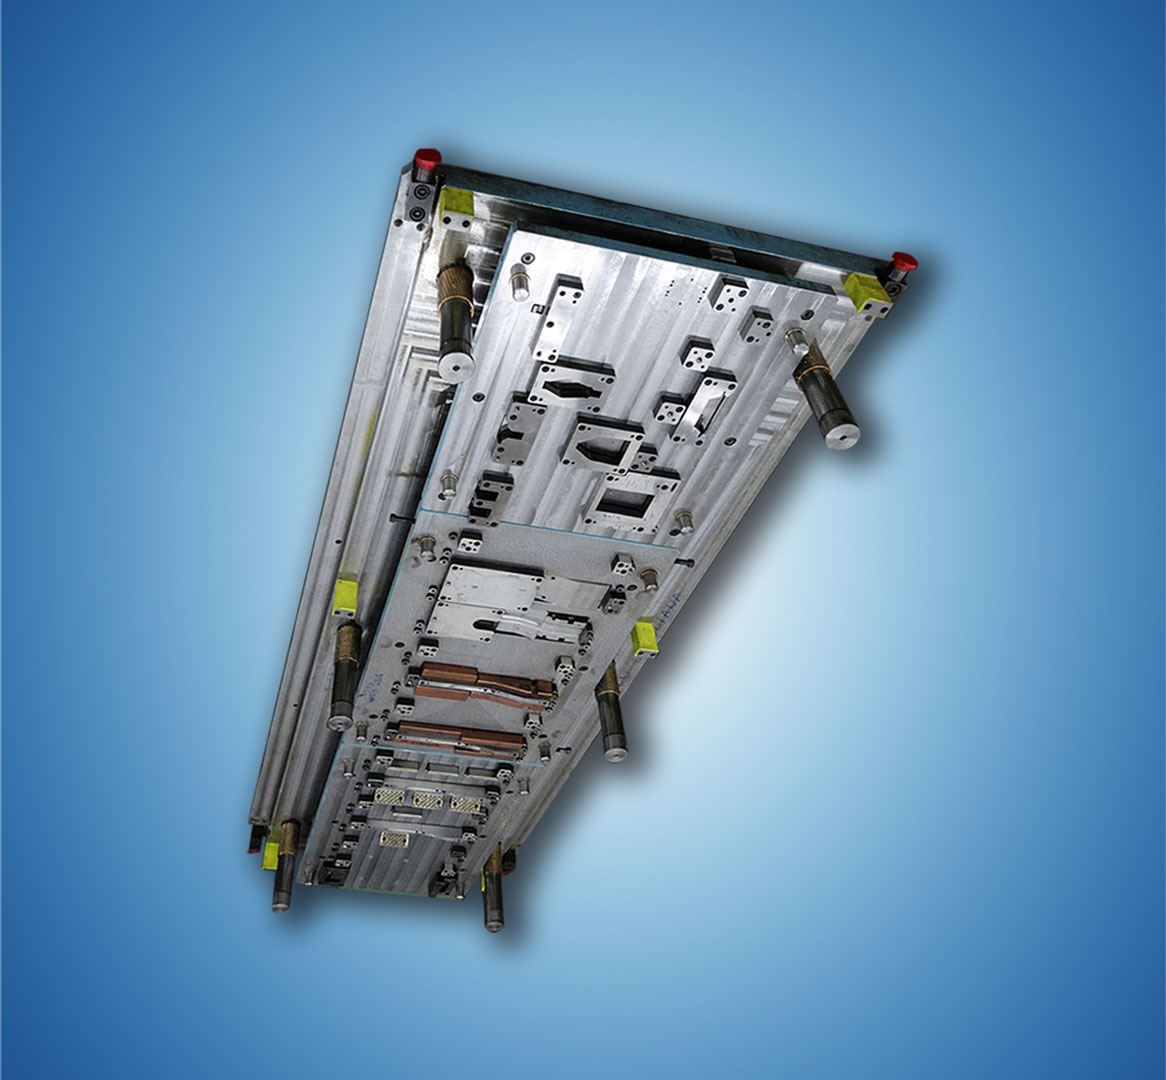 Ero-Projekt-d.o.o.-Toolshop-Werkzeugbau-5-Orodje-za-preoblikov--plocevine-_-slika-2